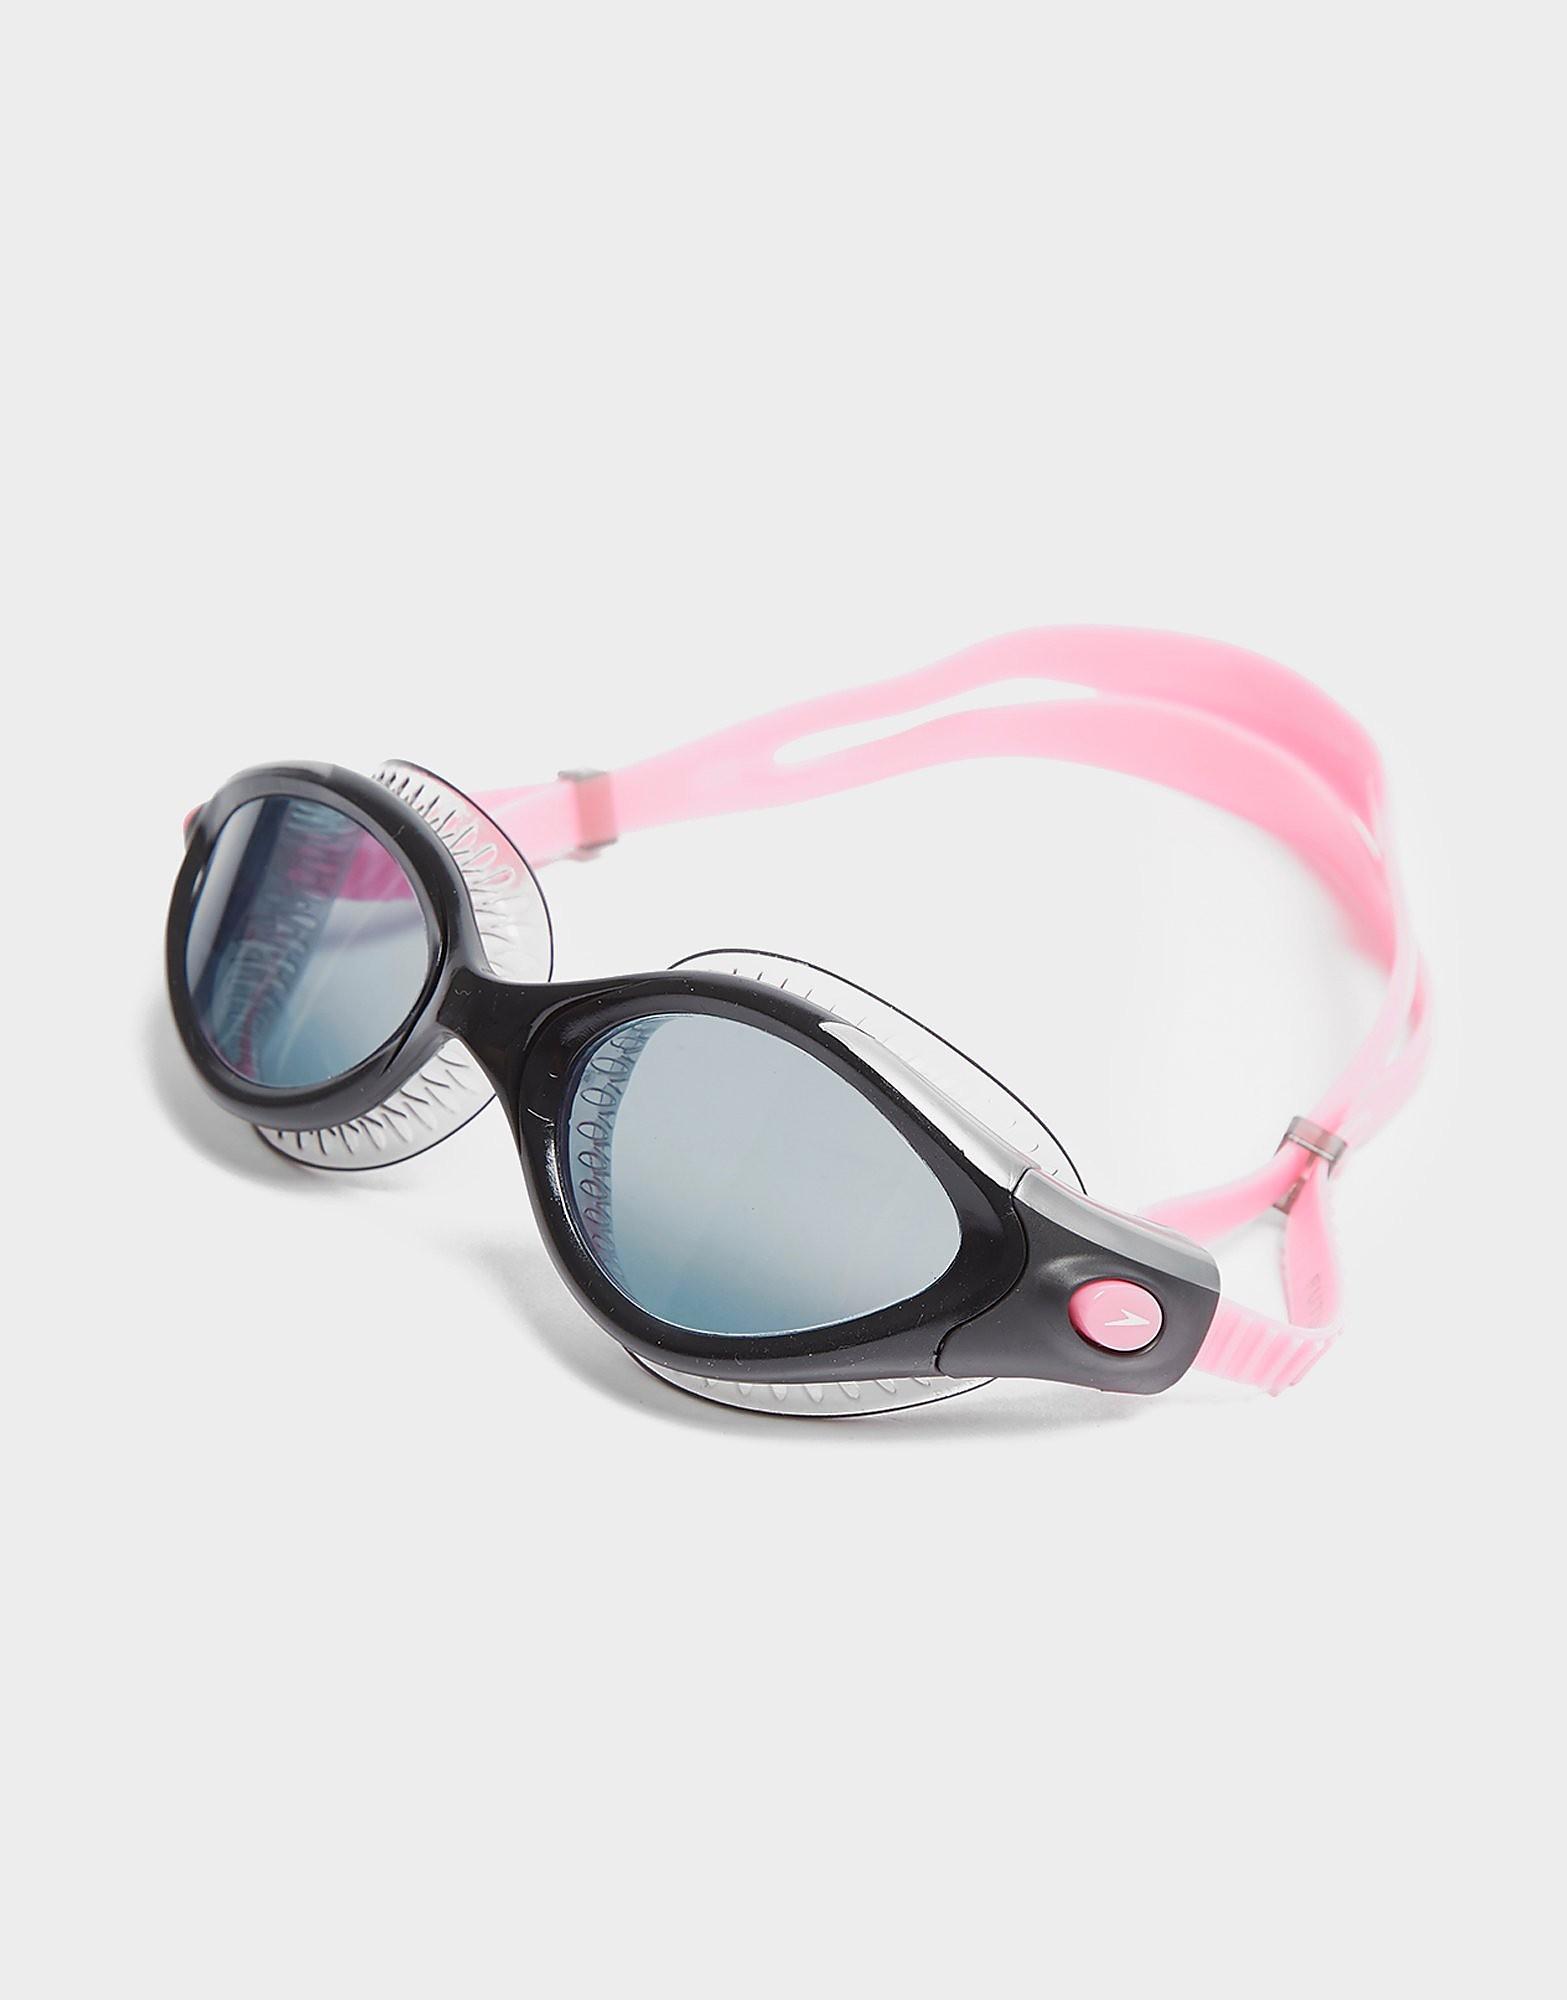 Speedo Futura Biofuse Lunettes de natation Femme